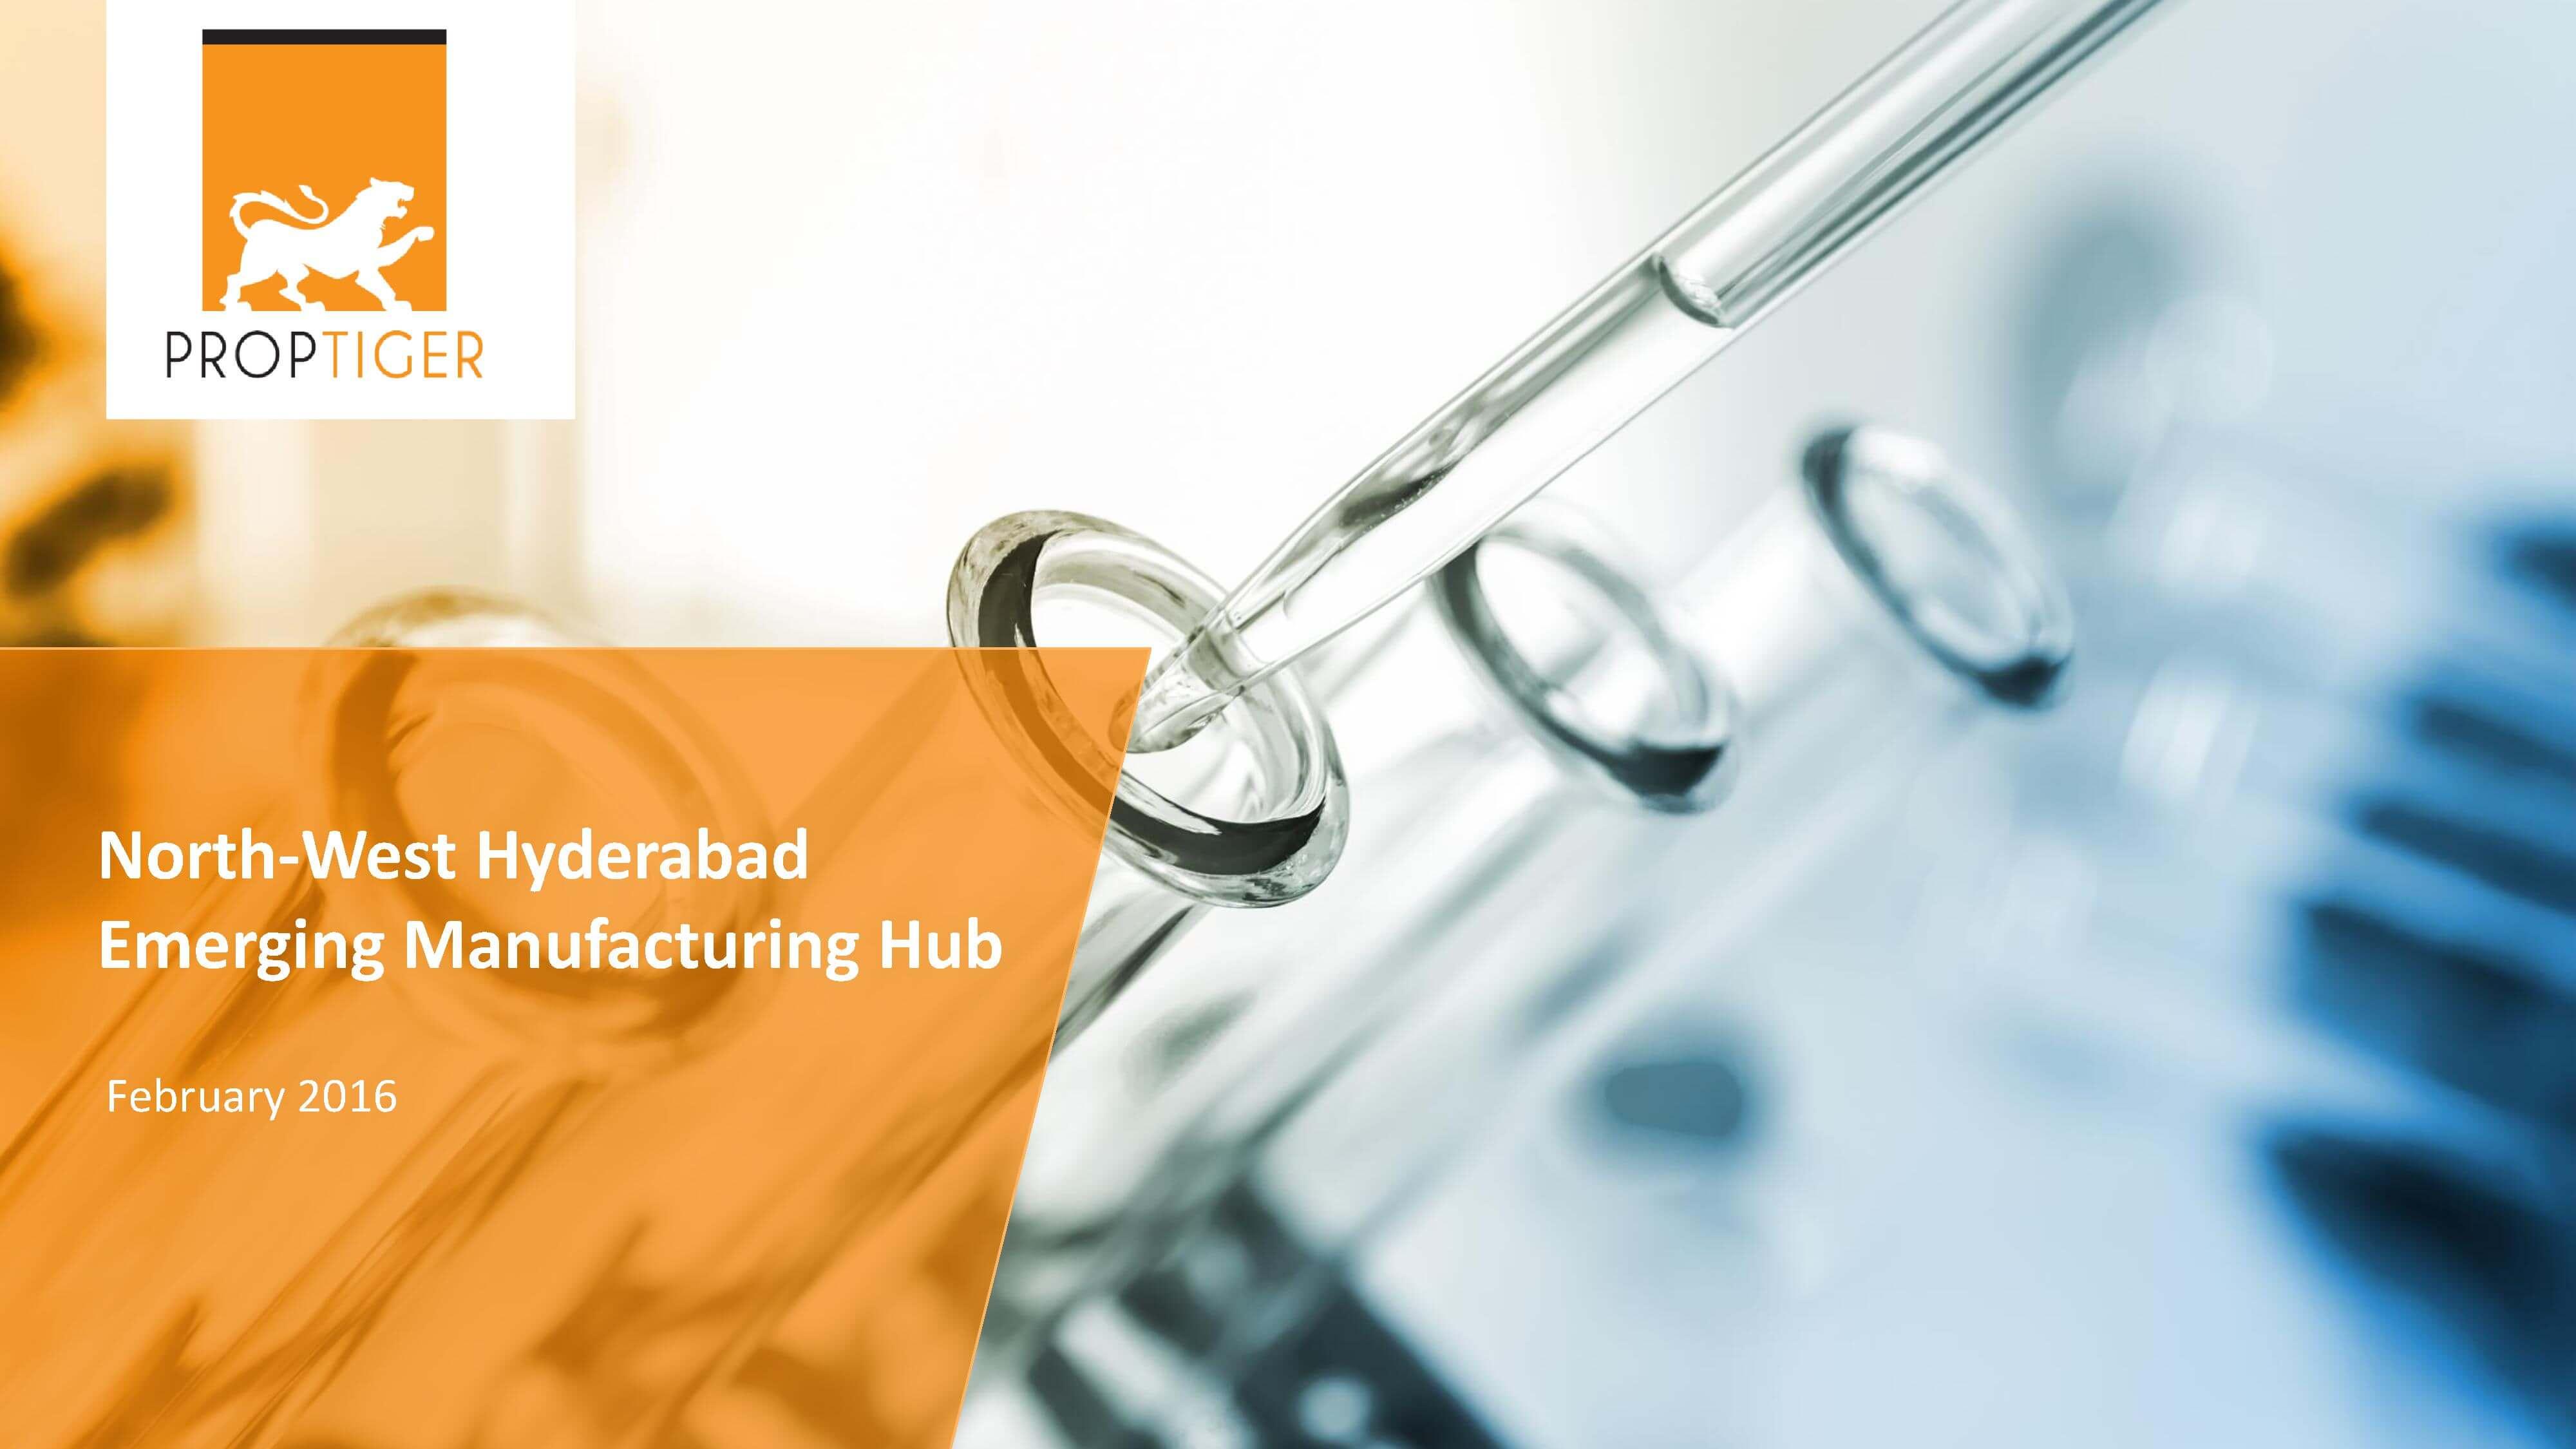 North-West Hyderabad, Emerging Manufacturing Hub